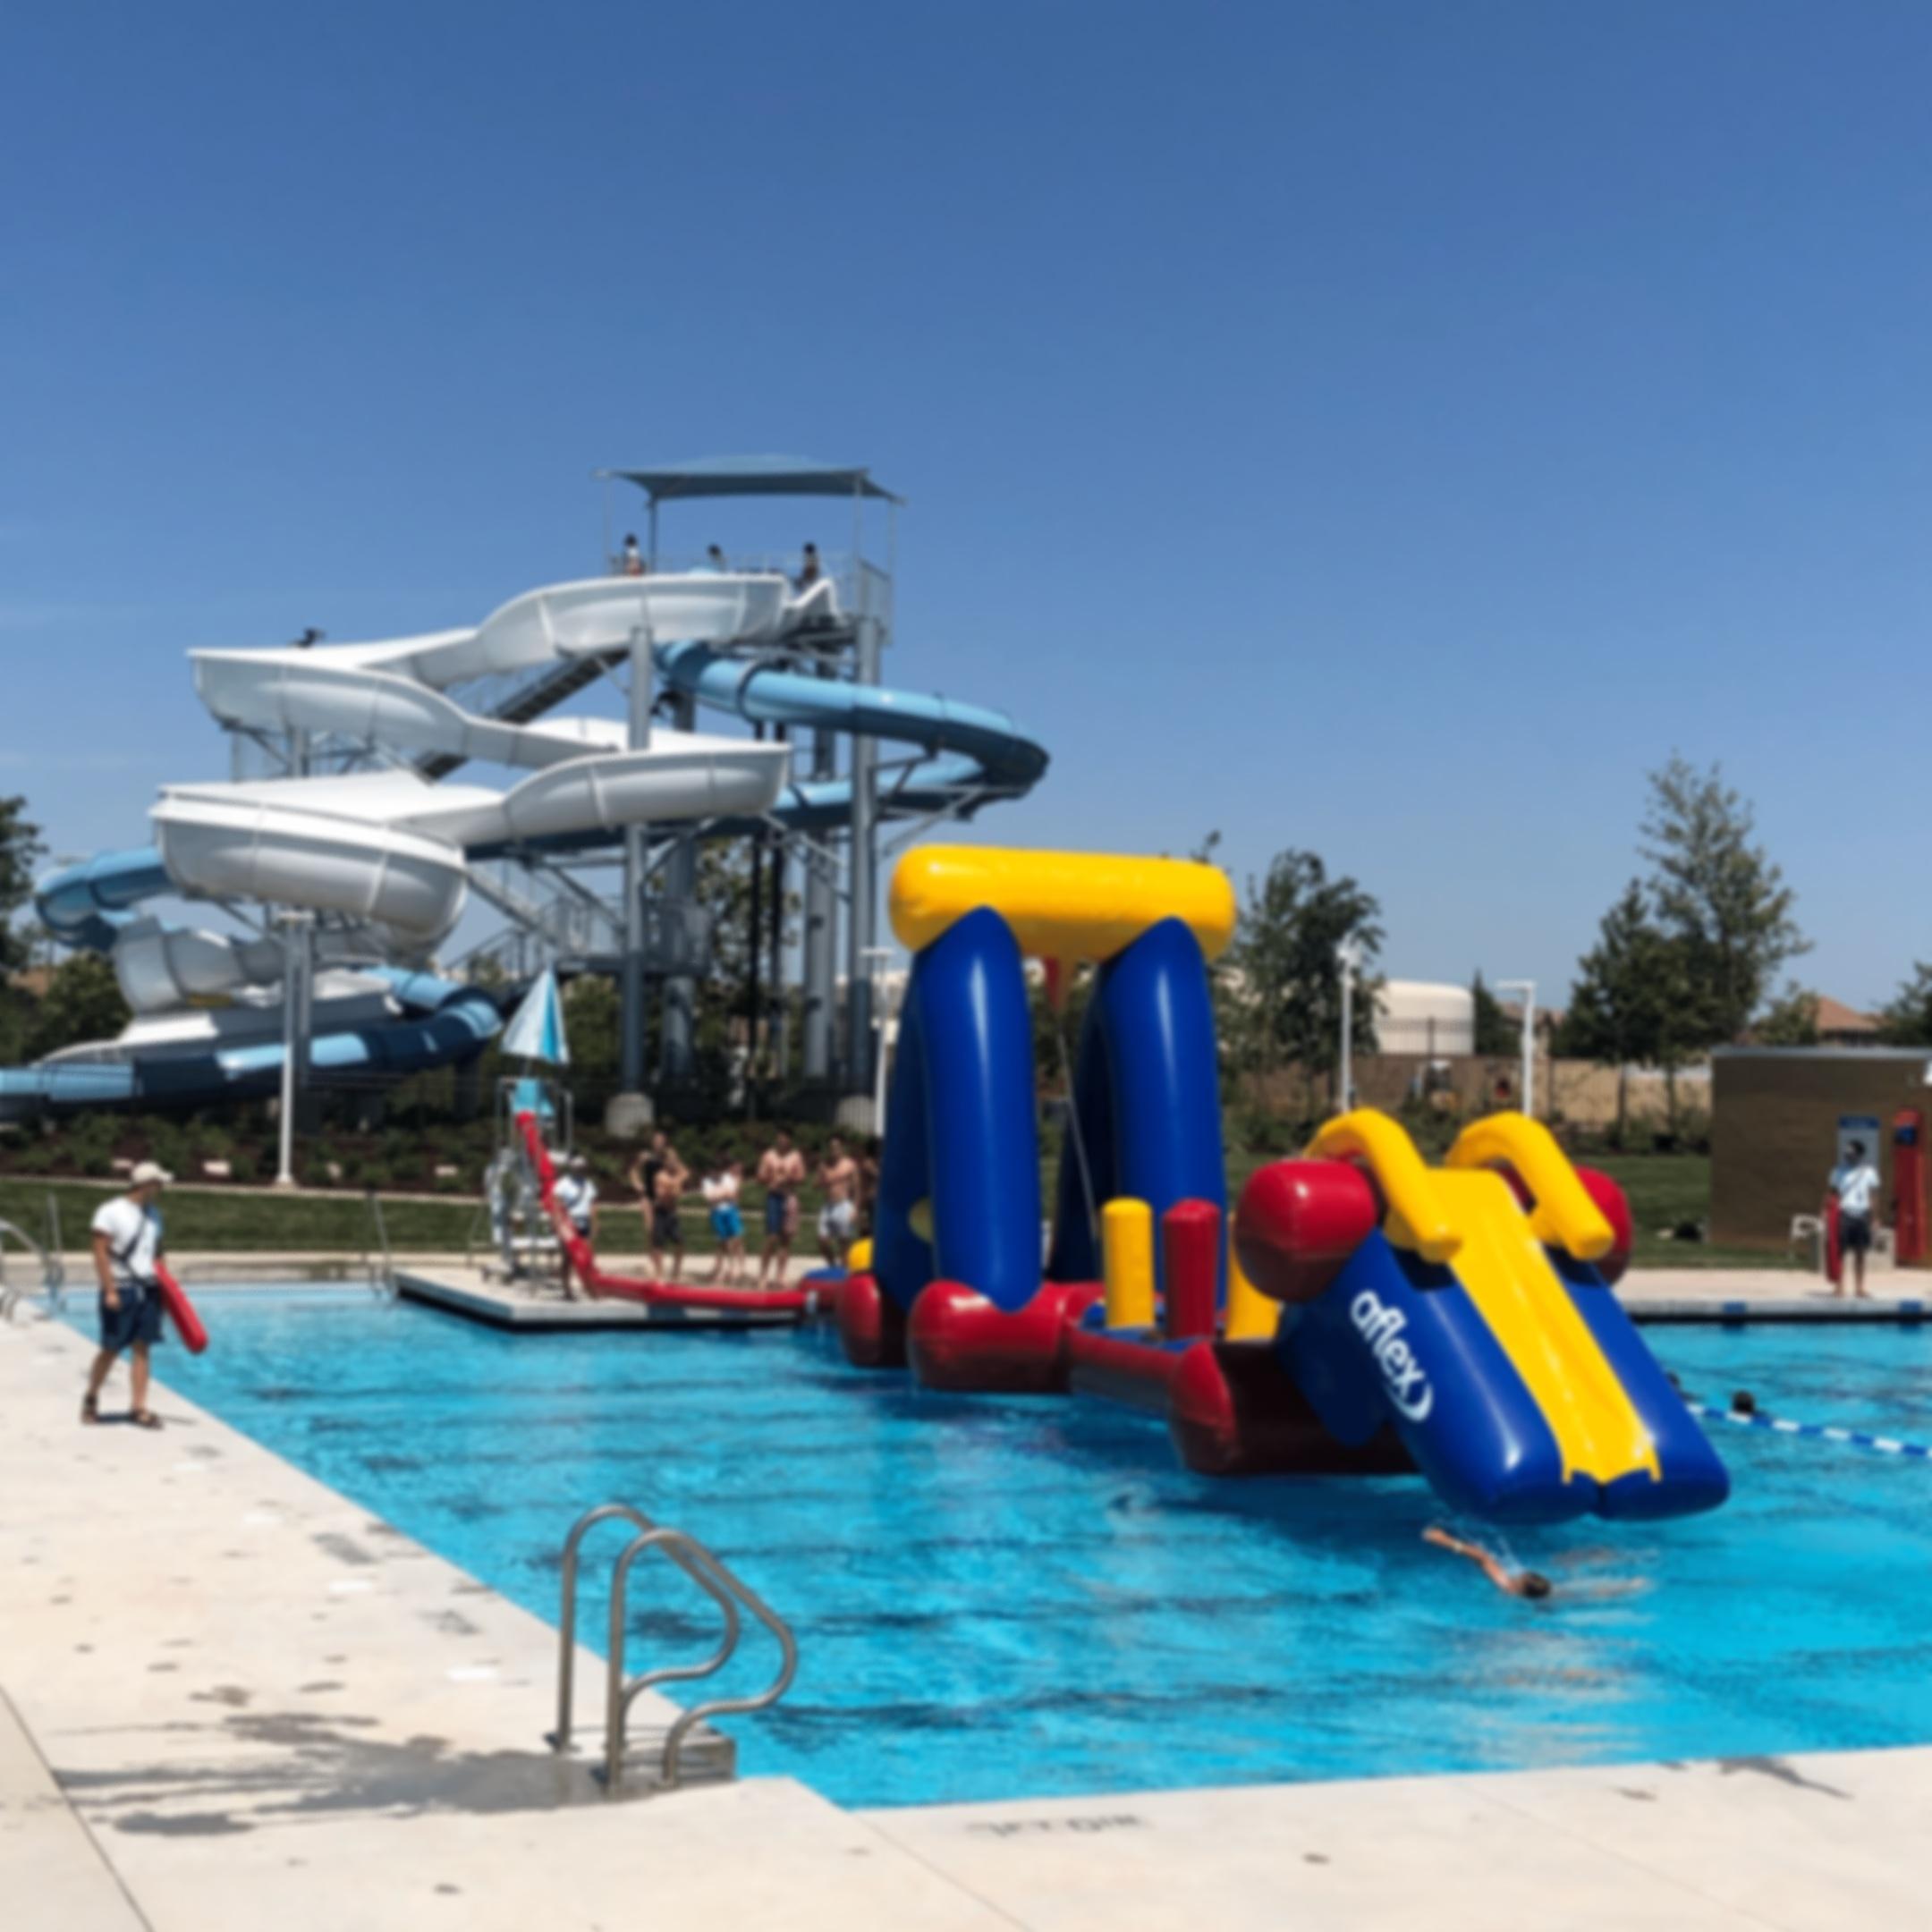 Elk Grove Aquatics Center - Inflatable Obstacle Course - Waterslide - Elk Grove, CA